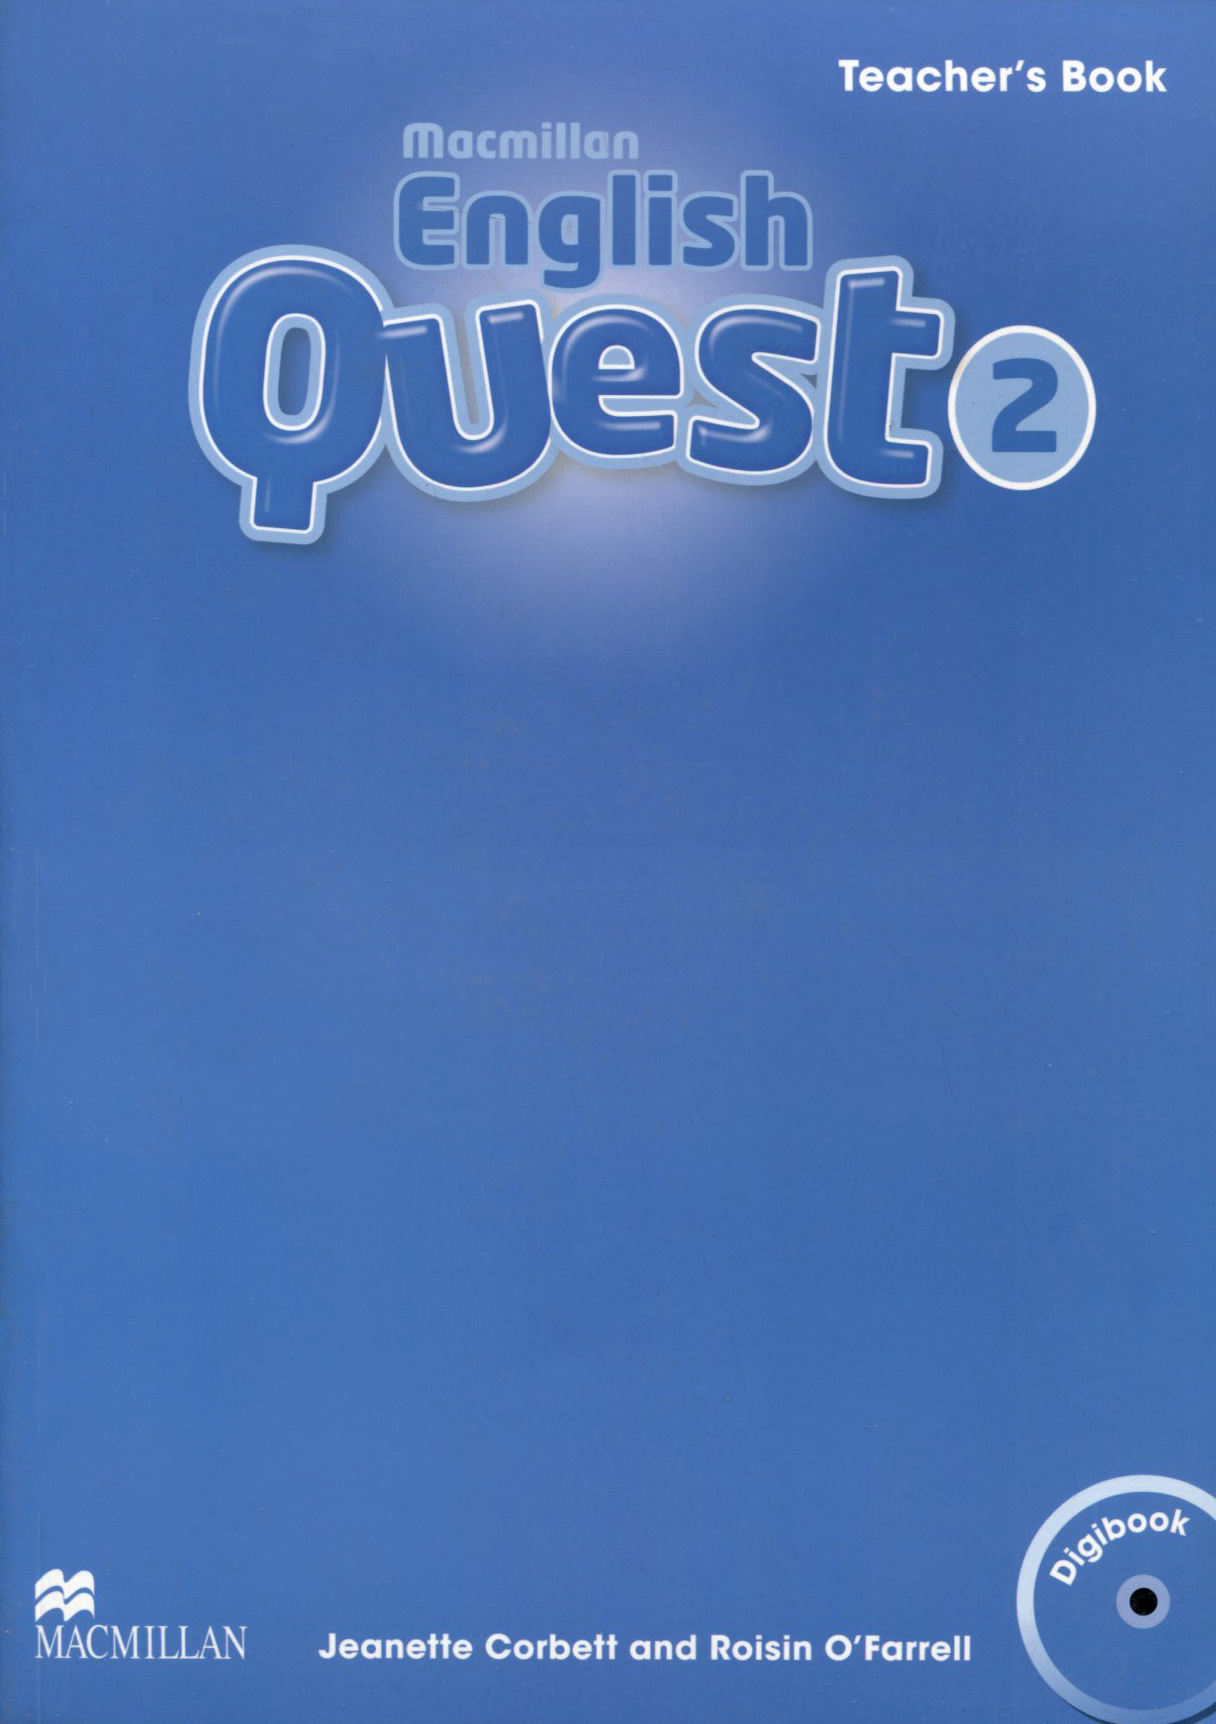 Macmillan English Quest 2: Teacher's Book (+ CD-ROM)